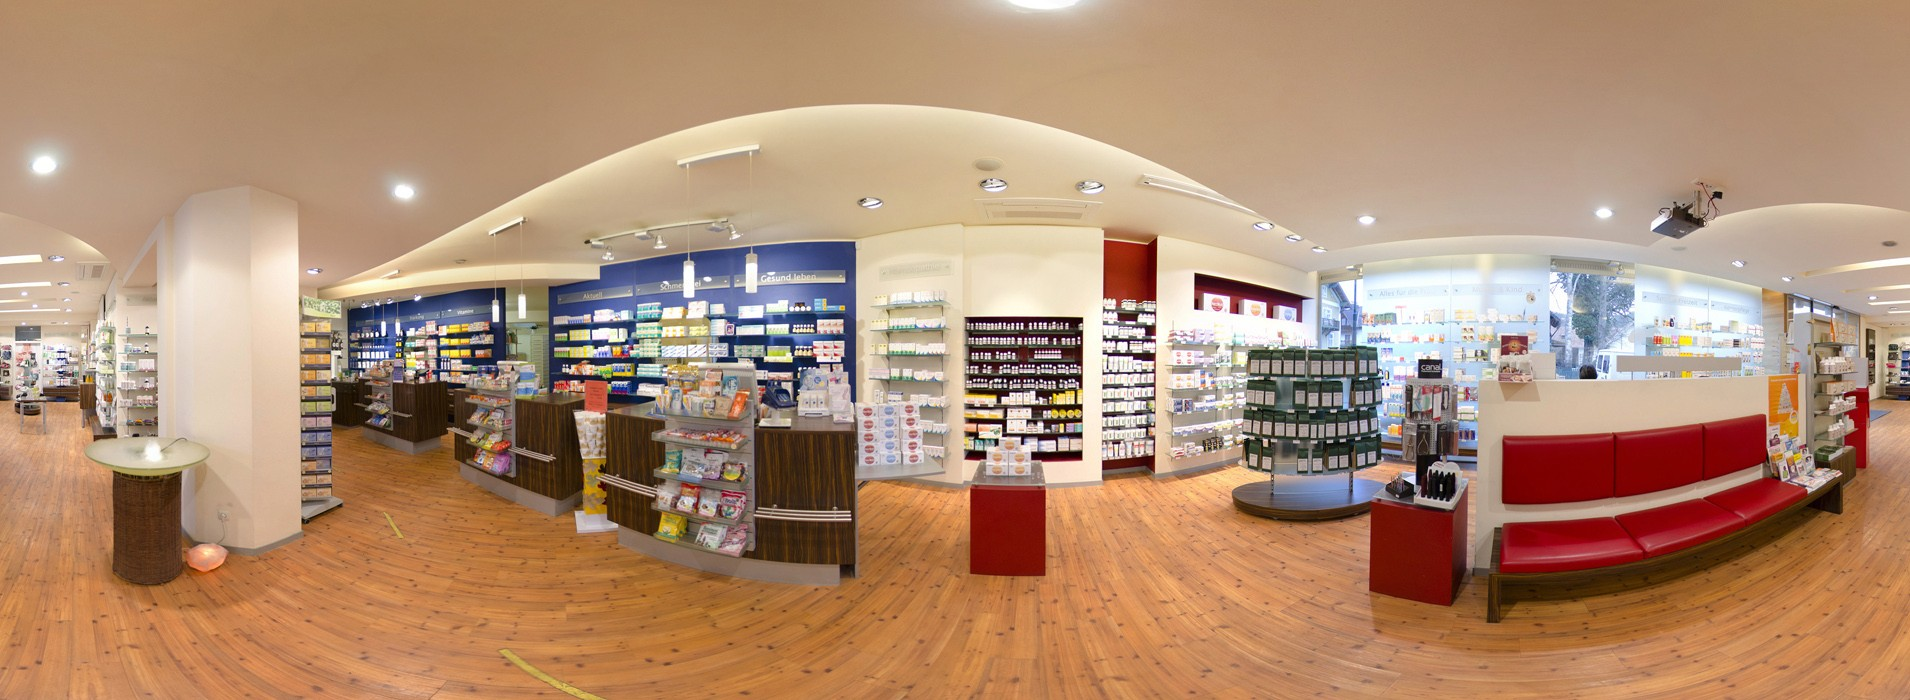 raimund apotheke in pernitz apotheke hom opathie kosmetik dienstleistungen. Black Bedroom Furniture Sets. Home Design Ideas